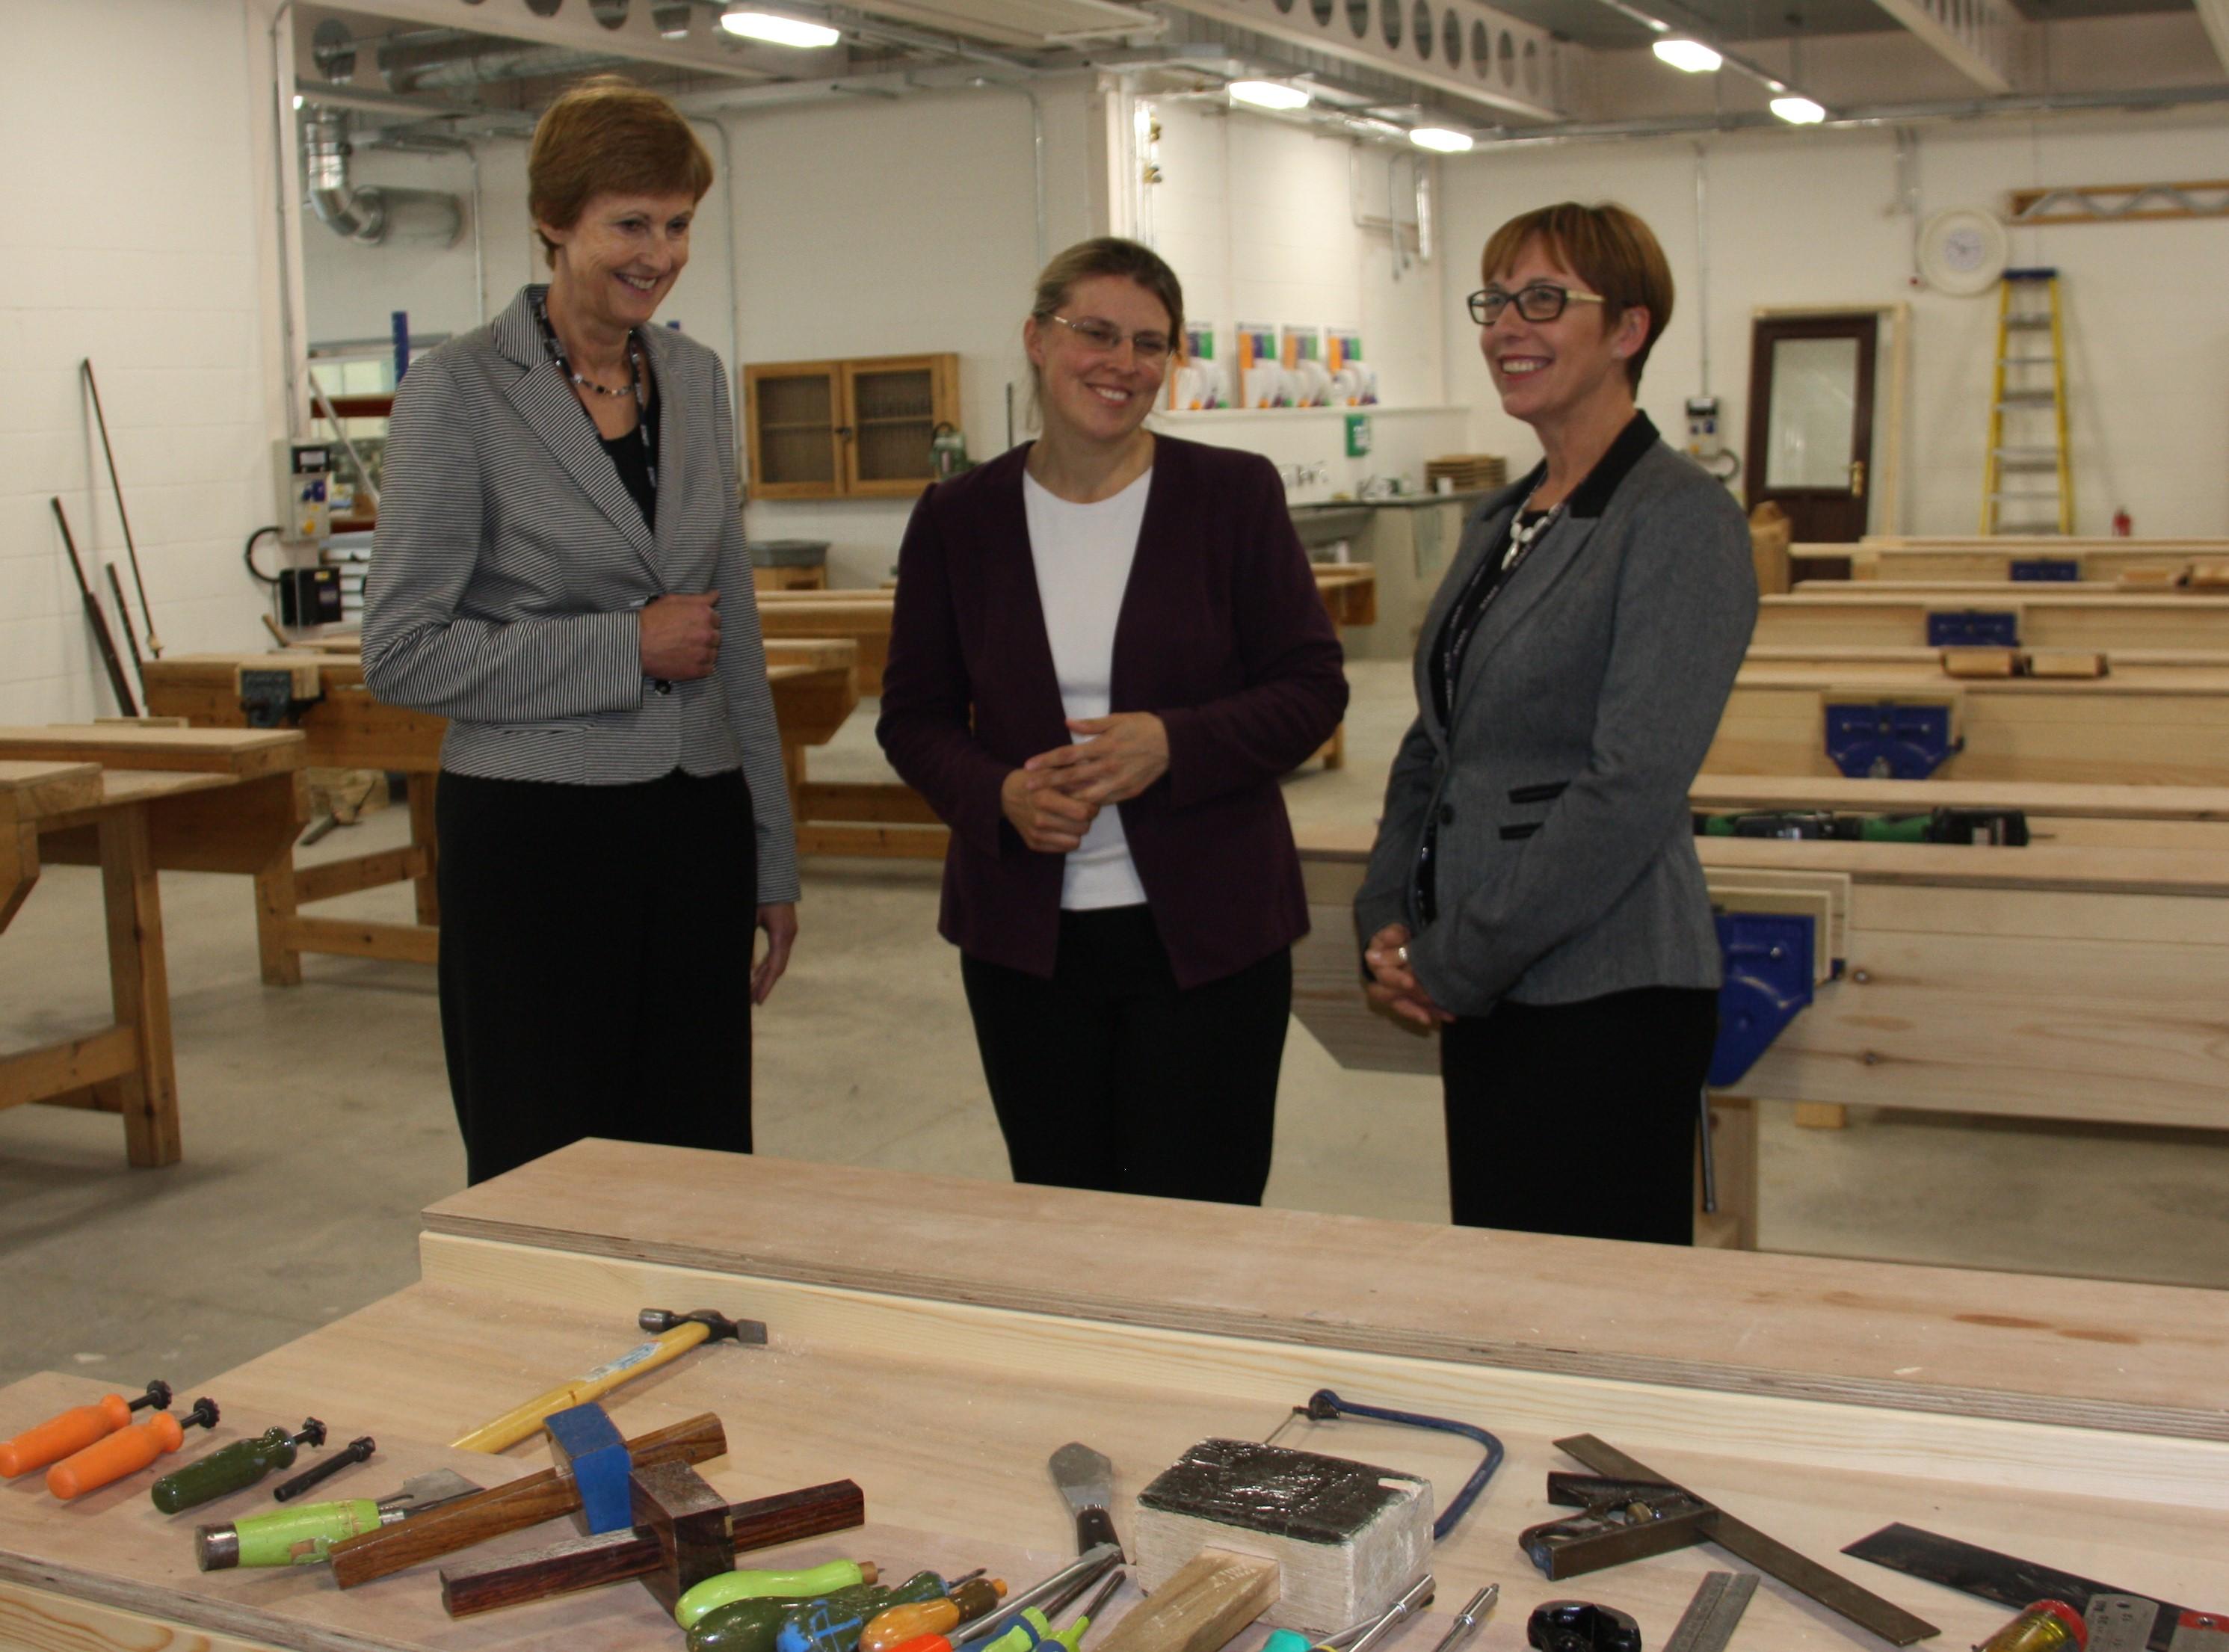 Rachael_Maskell_visit_York_College_Construction_Centre2.jpg